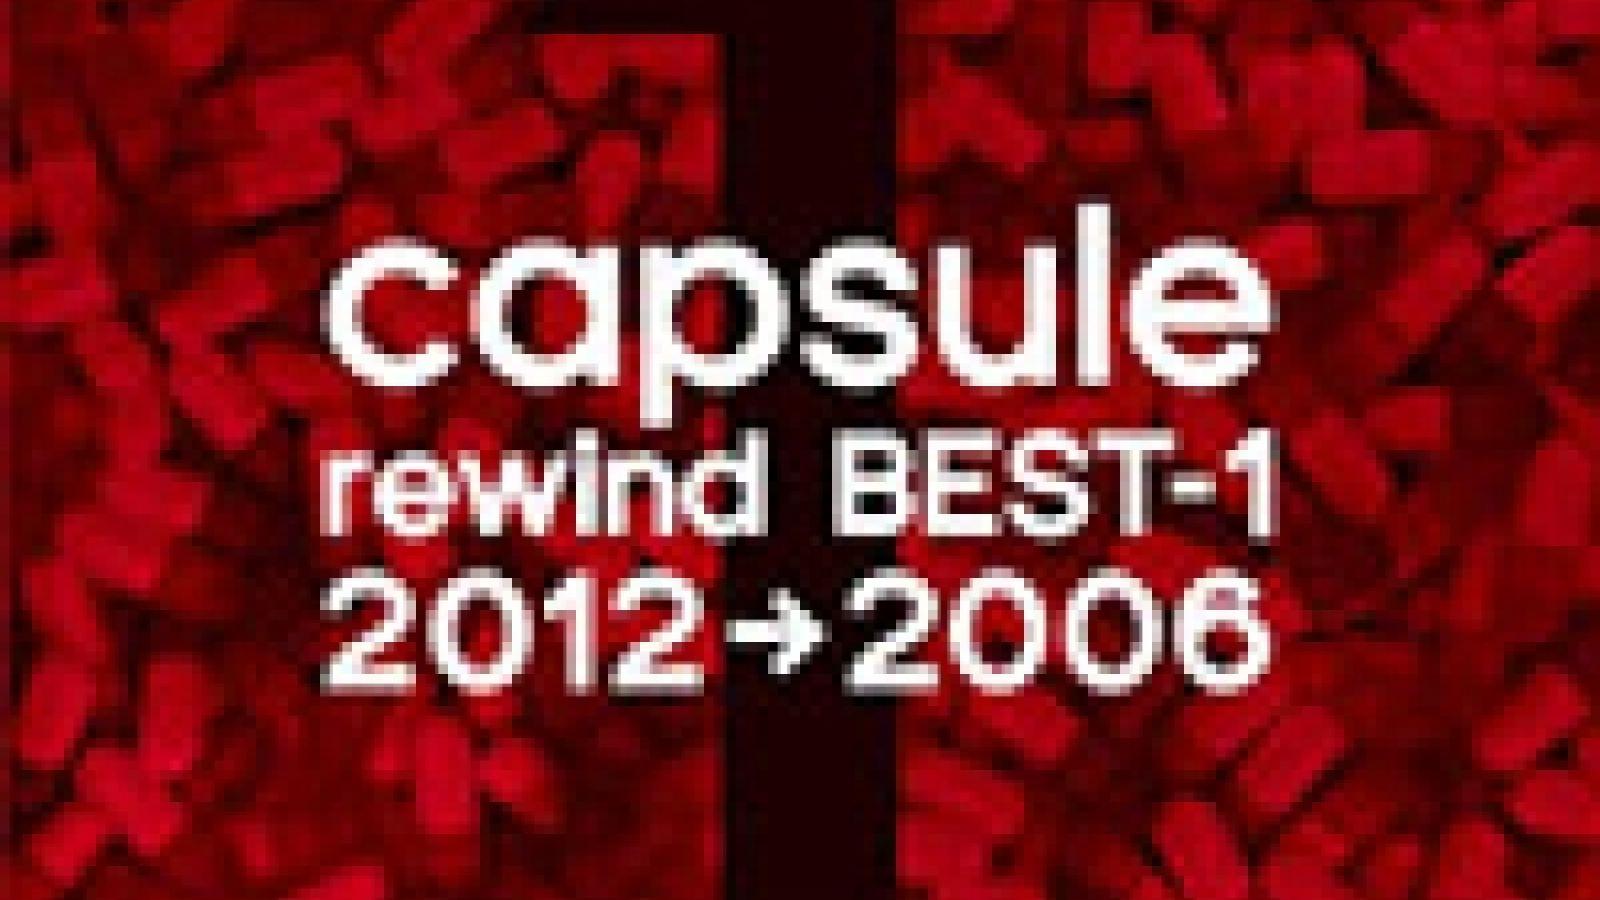 Álbumes recopilatorios de capsule © 2014 Warner Music Japan Inc. All rights reserved.